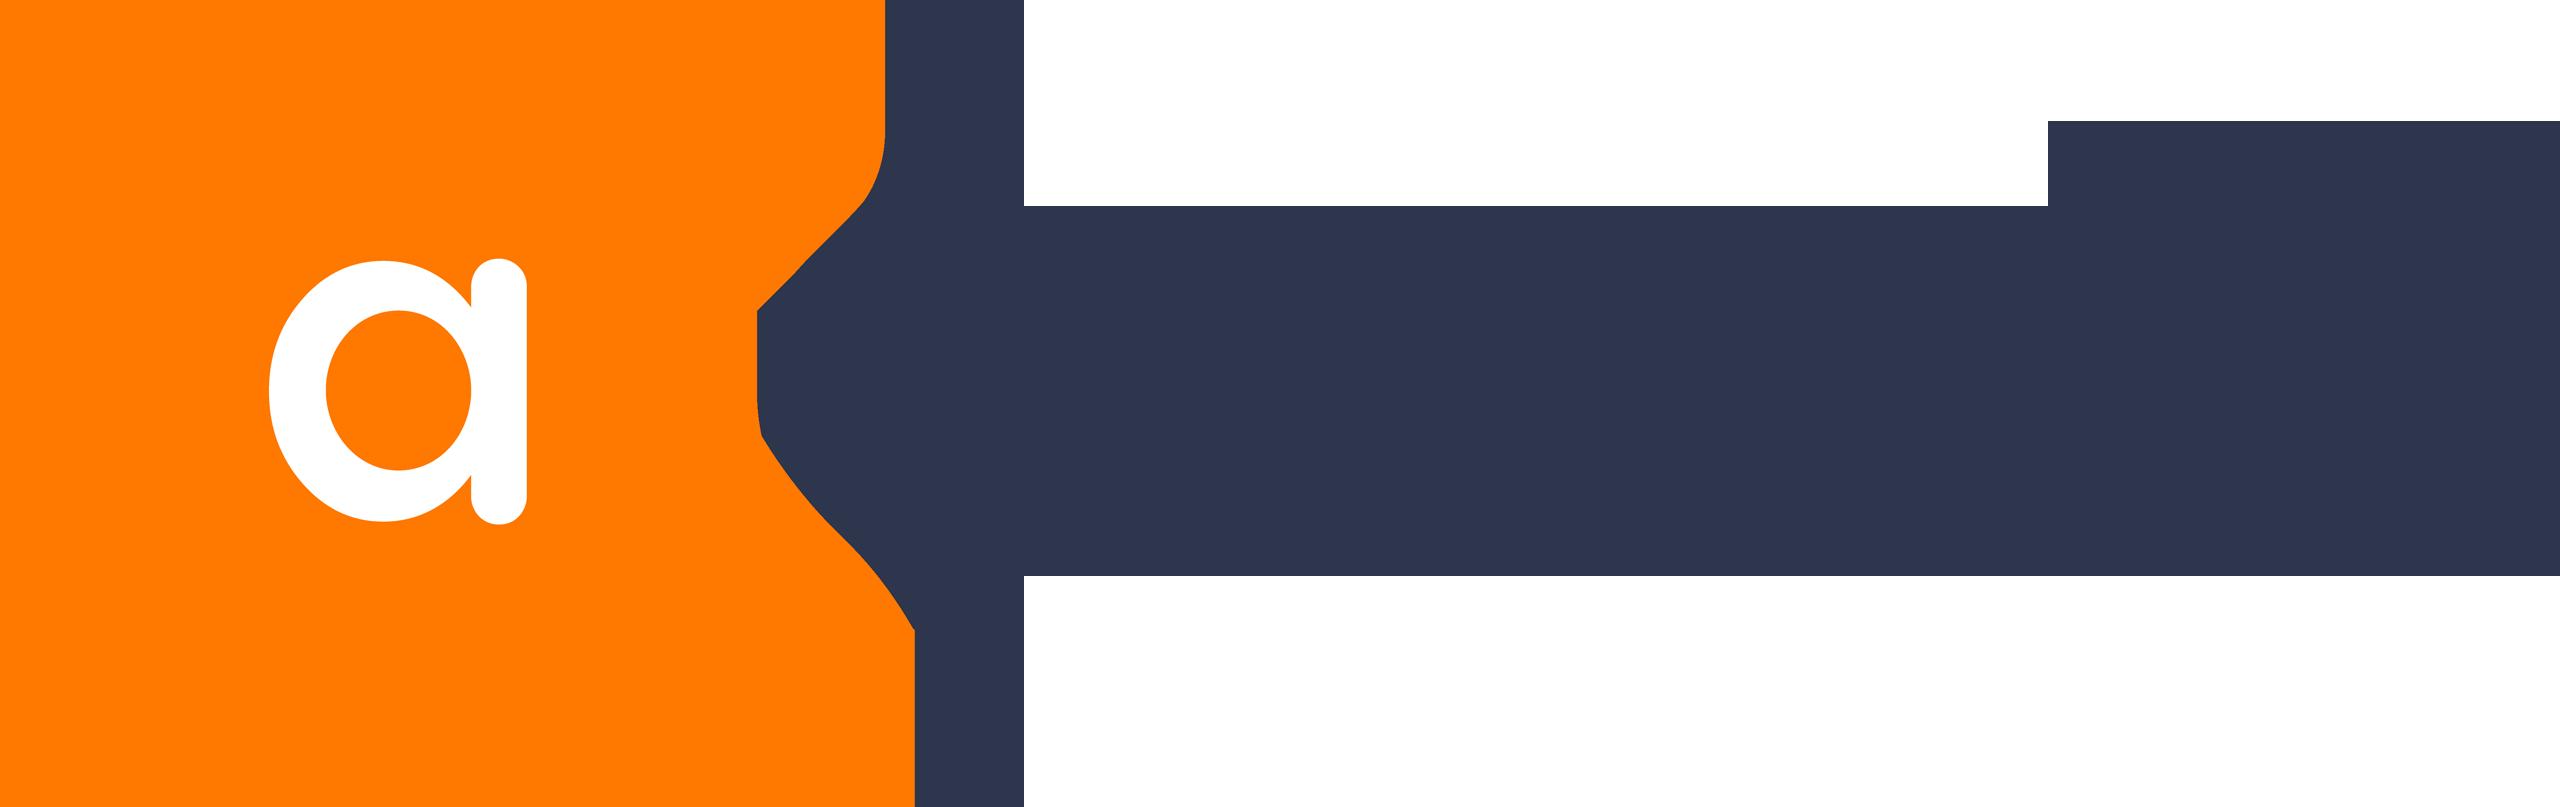 Avast Antivirus PNG - 29518